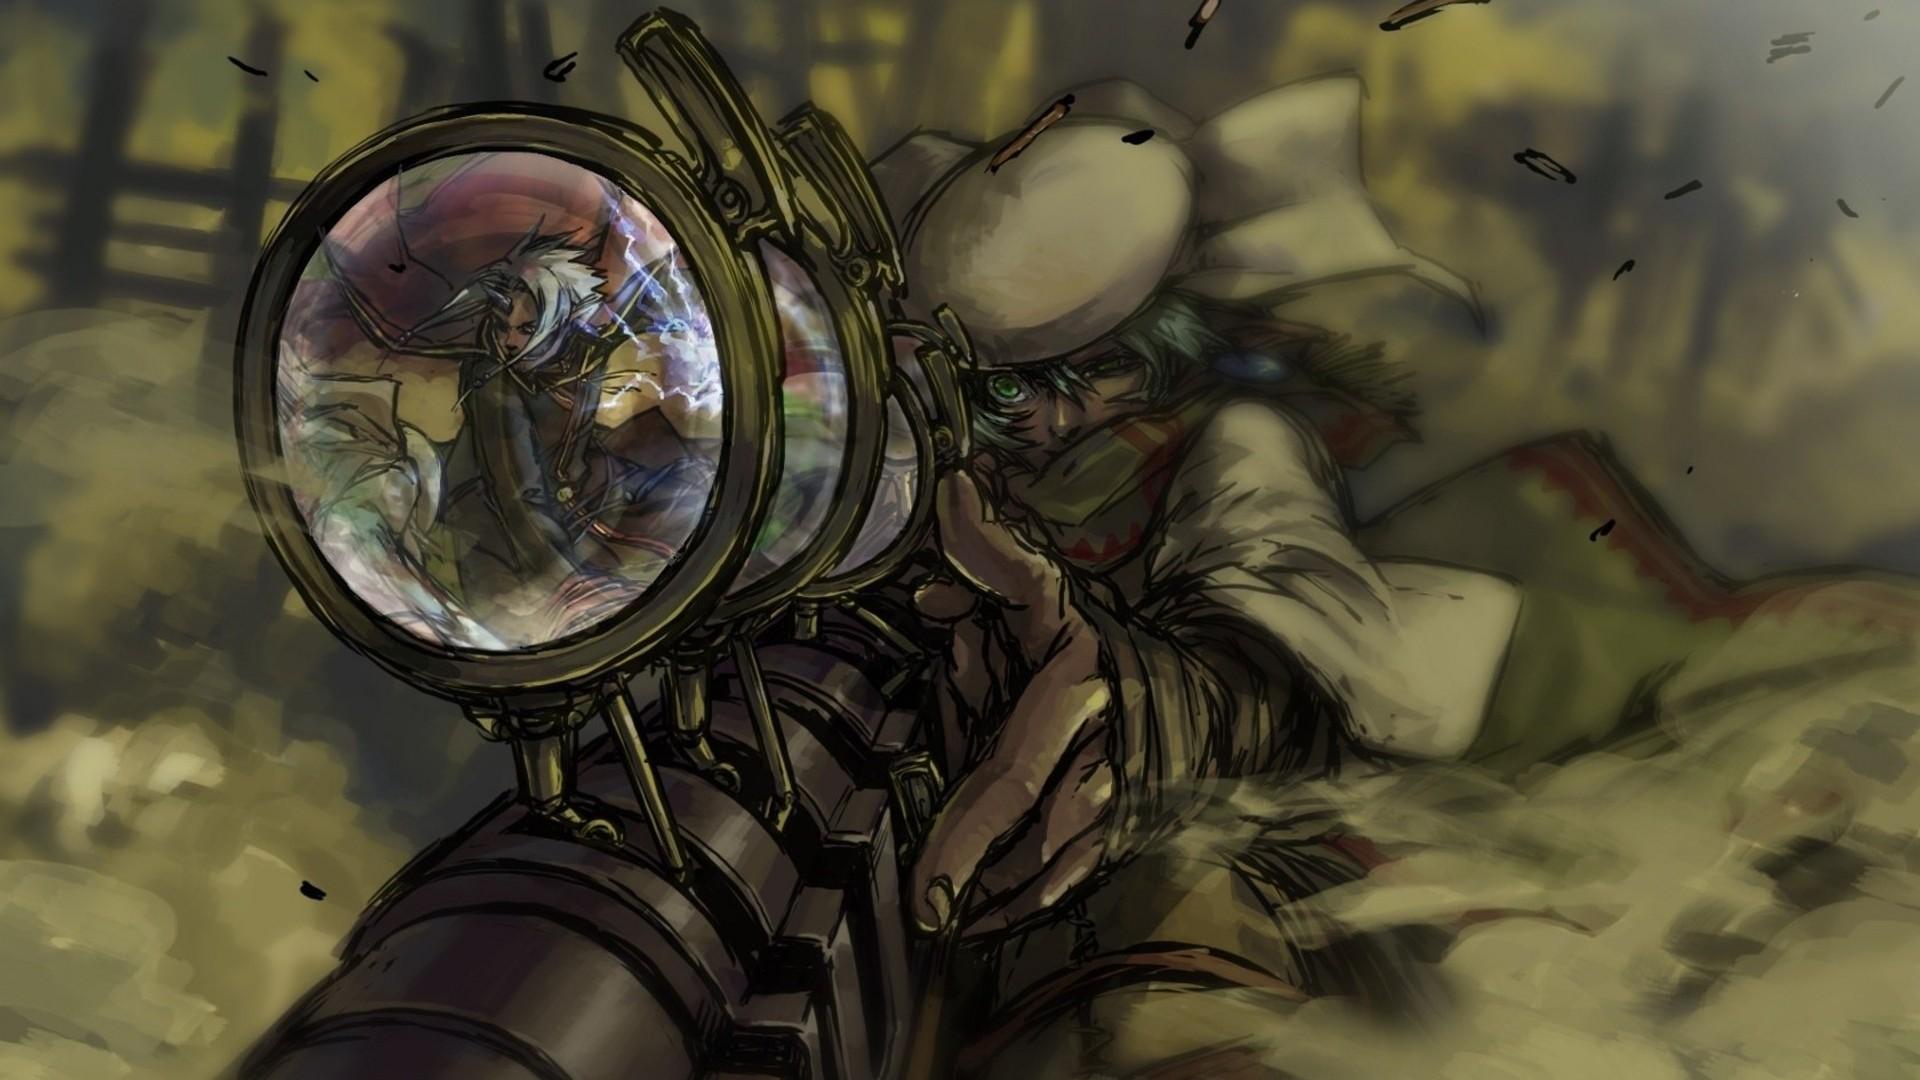 Epic Anime Guns High Resolution Wallpaper HD Wallpapers px 647.45  KB